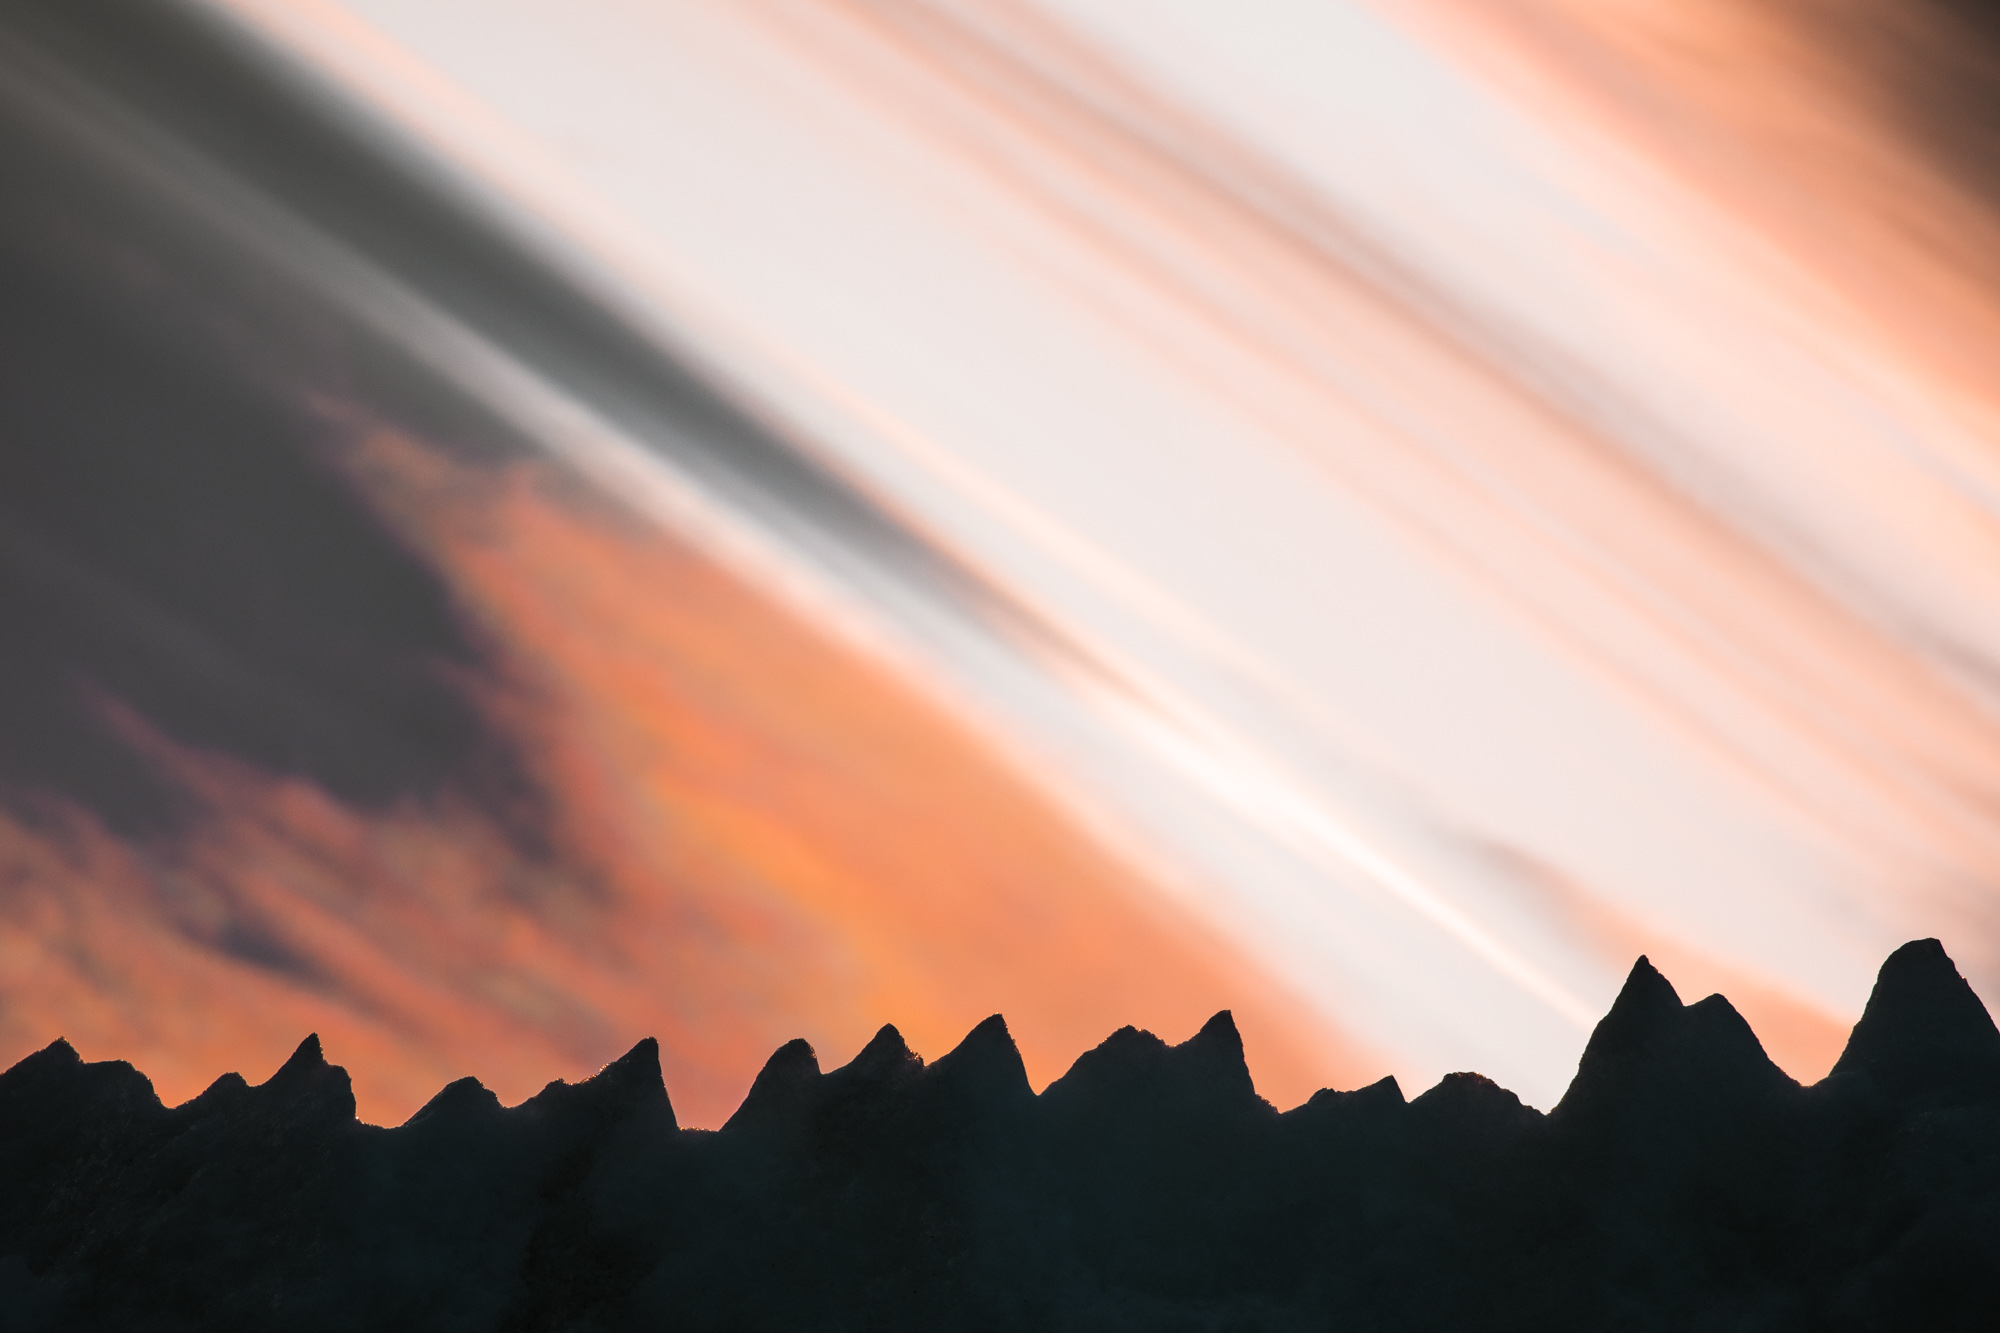 Midnight sun colors in Svalbard, Norway